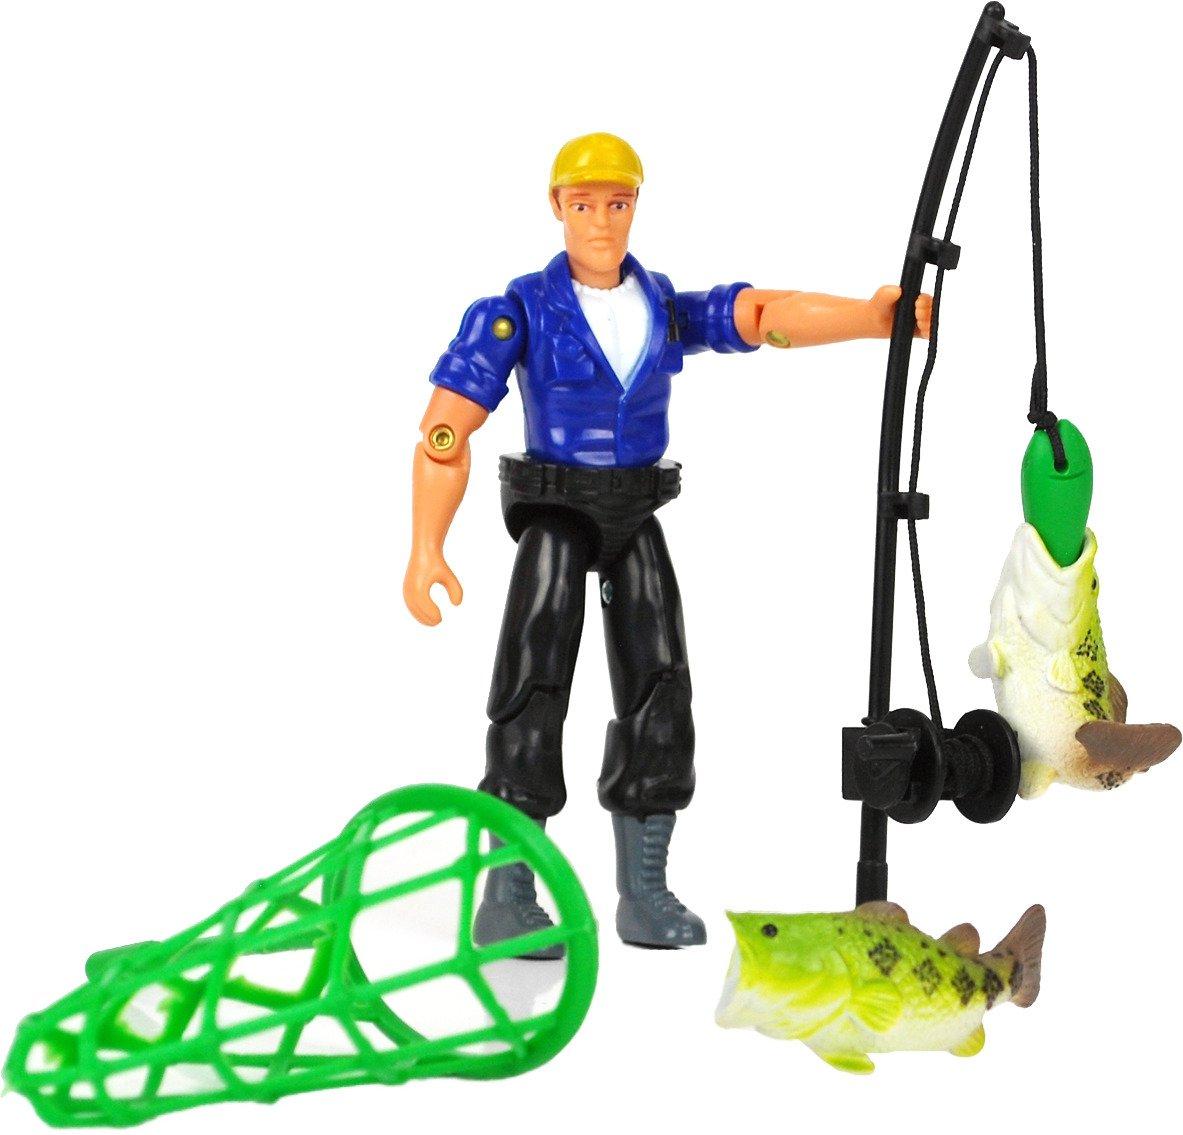 Tree House Kids Imagination Adventure Series Fishing Accessories with Figure Set